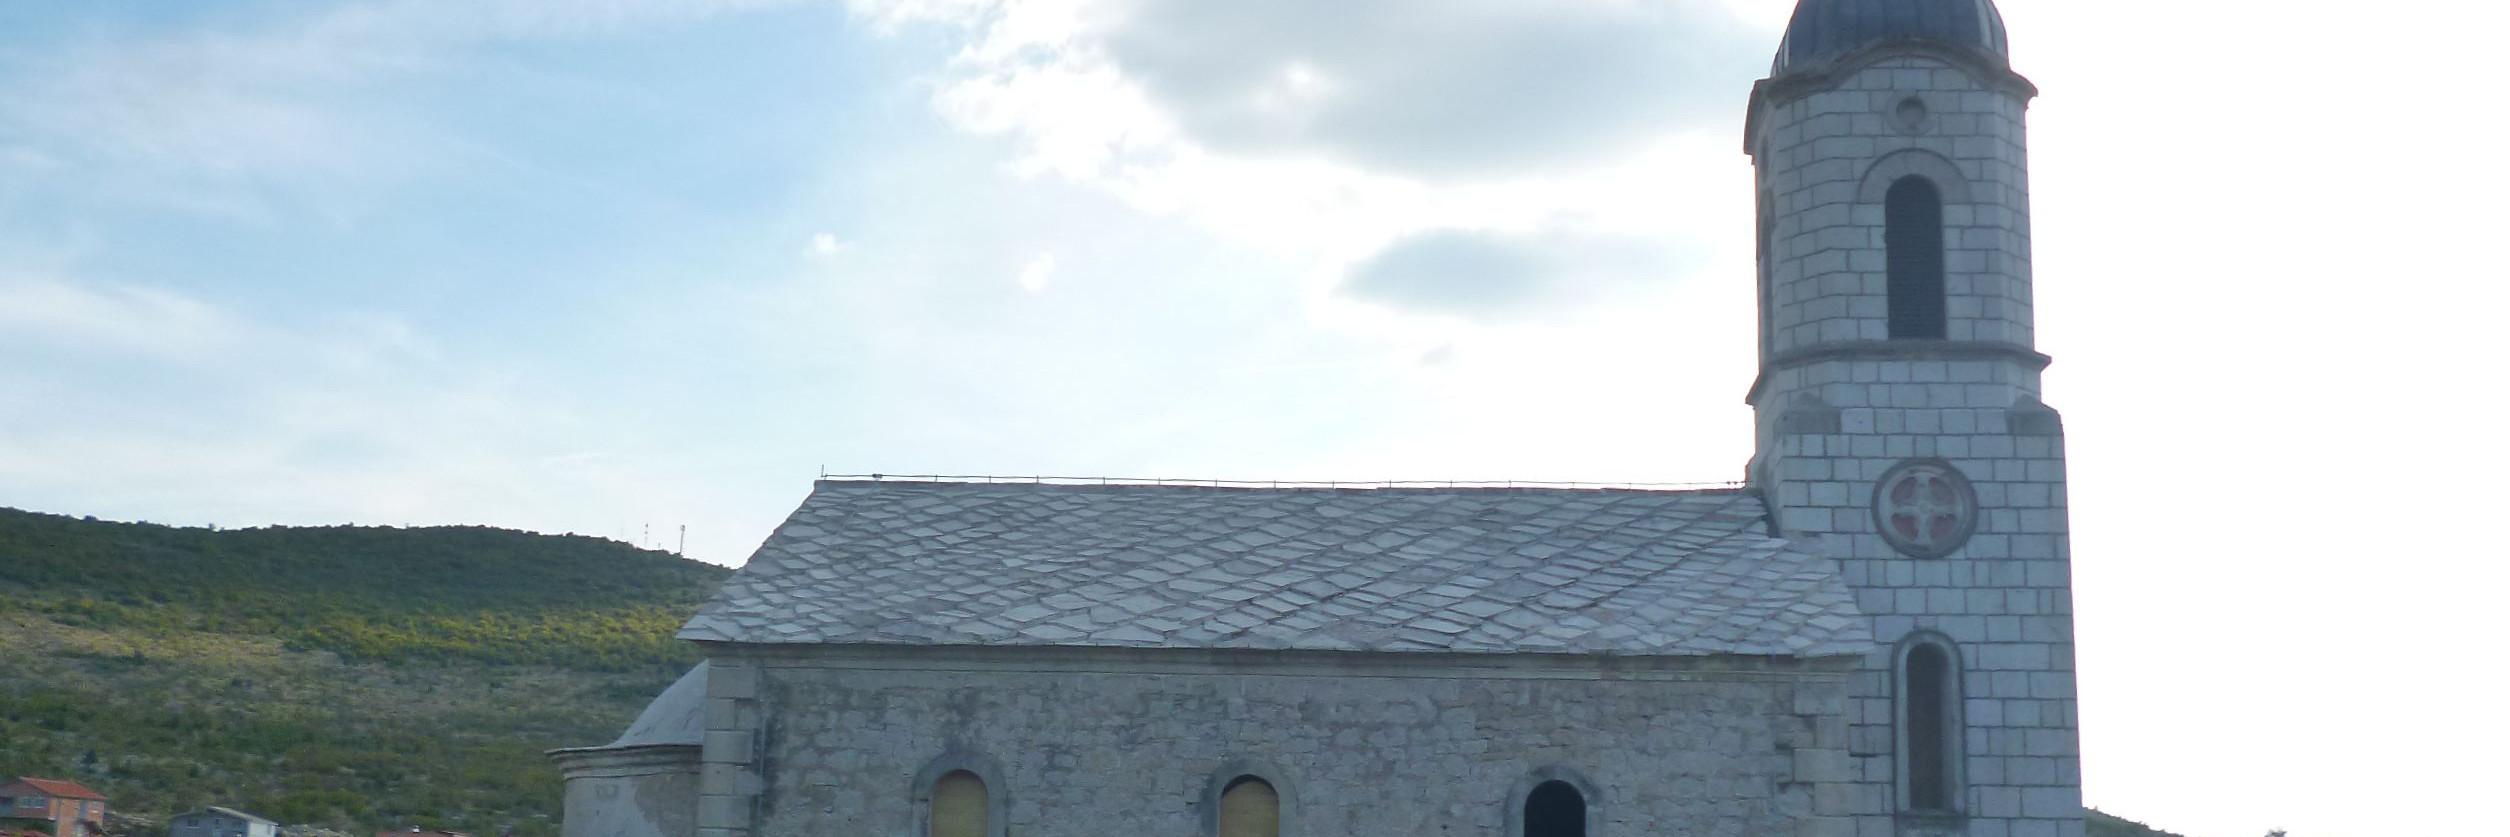 Церковь св. Василия Острожского. Фото: Елена Арсениевич, CC BY-SA 3.0